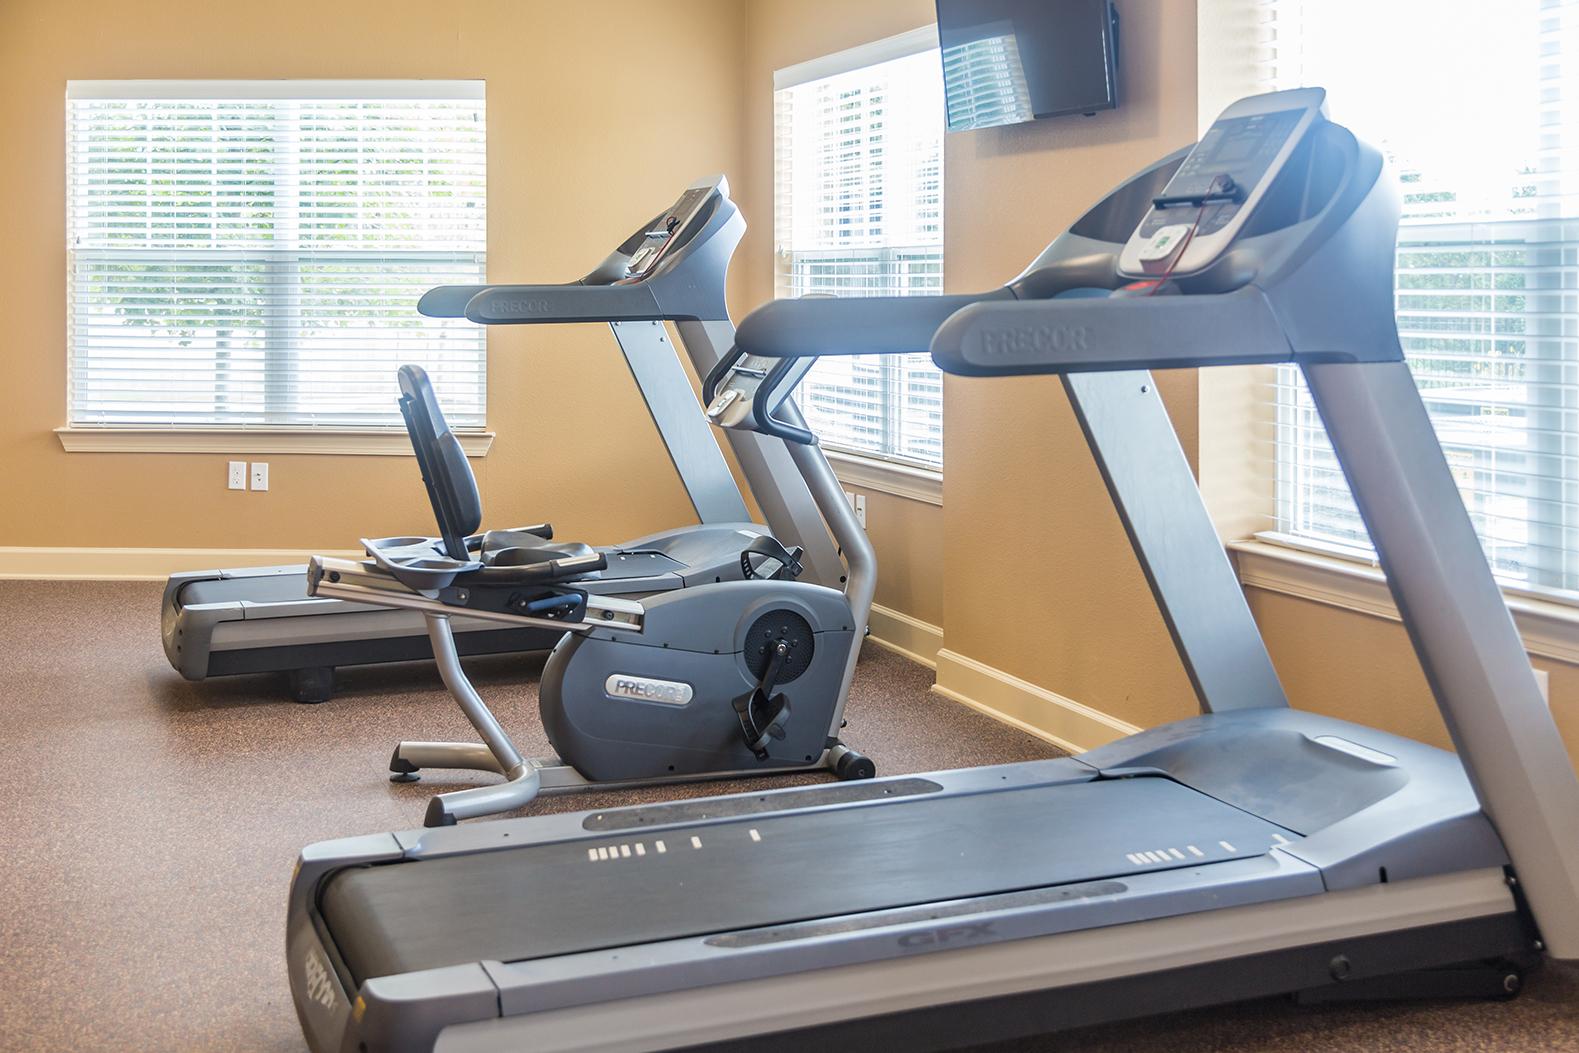 Treadmill, bike, and elliptical inside the Stallion Point fitness center